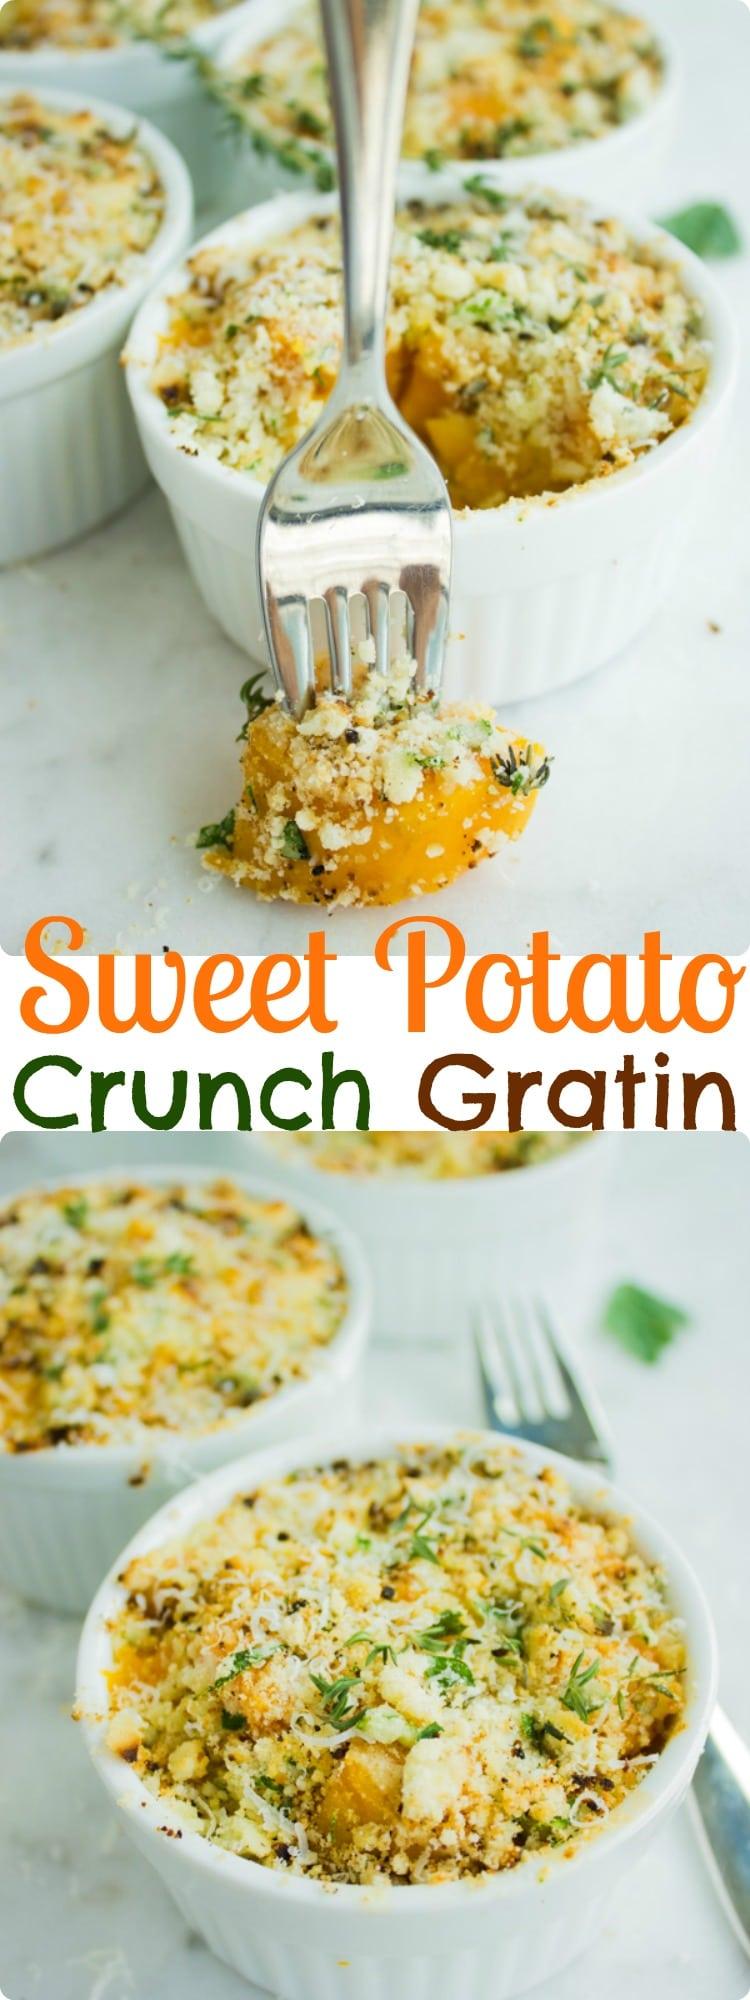 Sweet Potato Gratin with Crunchy Parmesan Crumble Topping